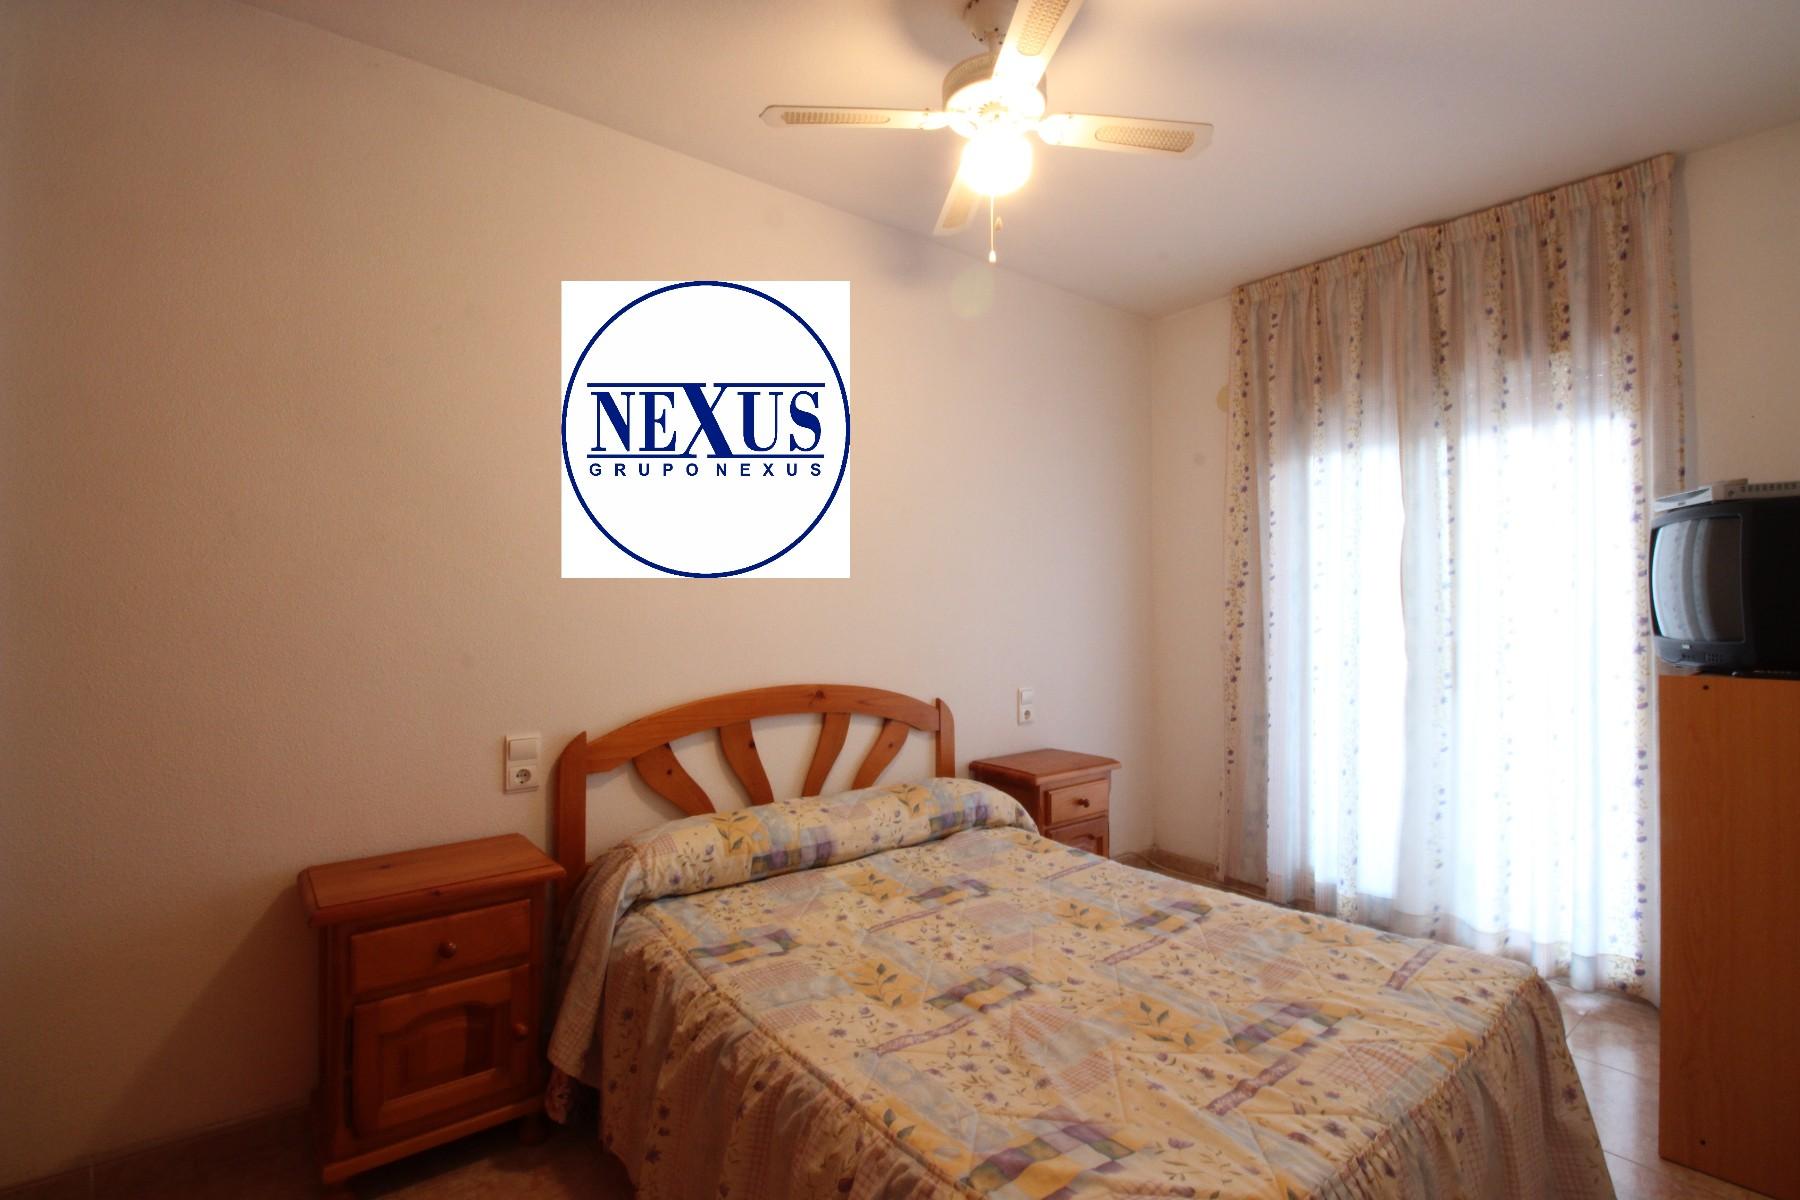 PentHouse (Torrevieja) in Nexus Grupo